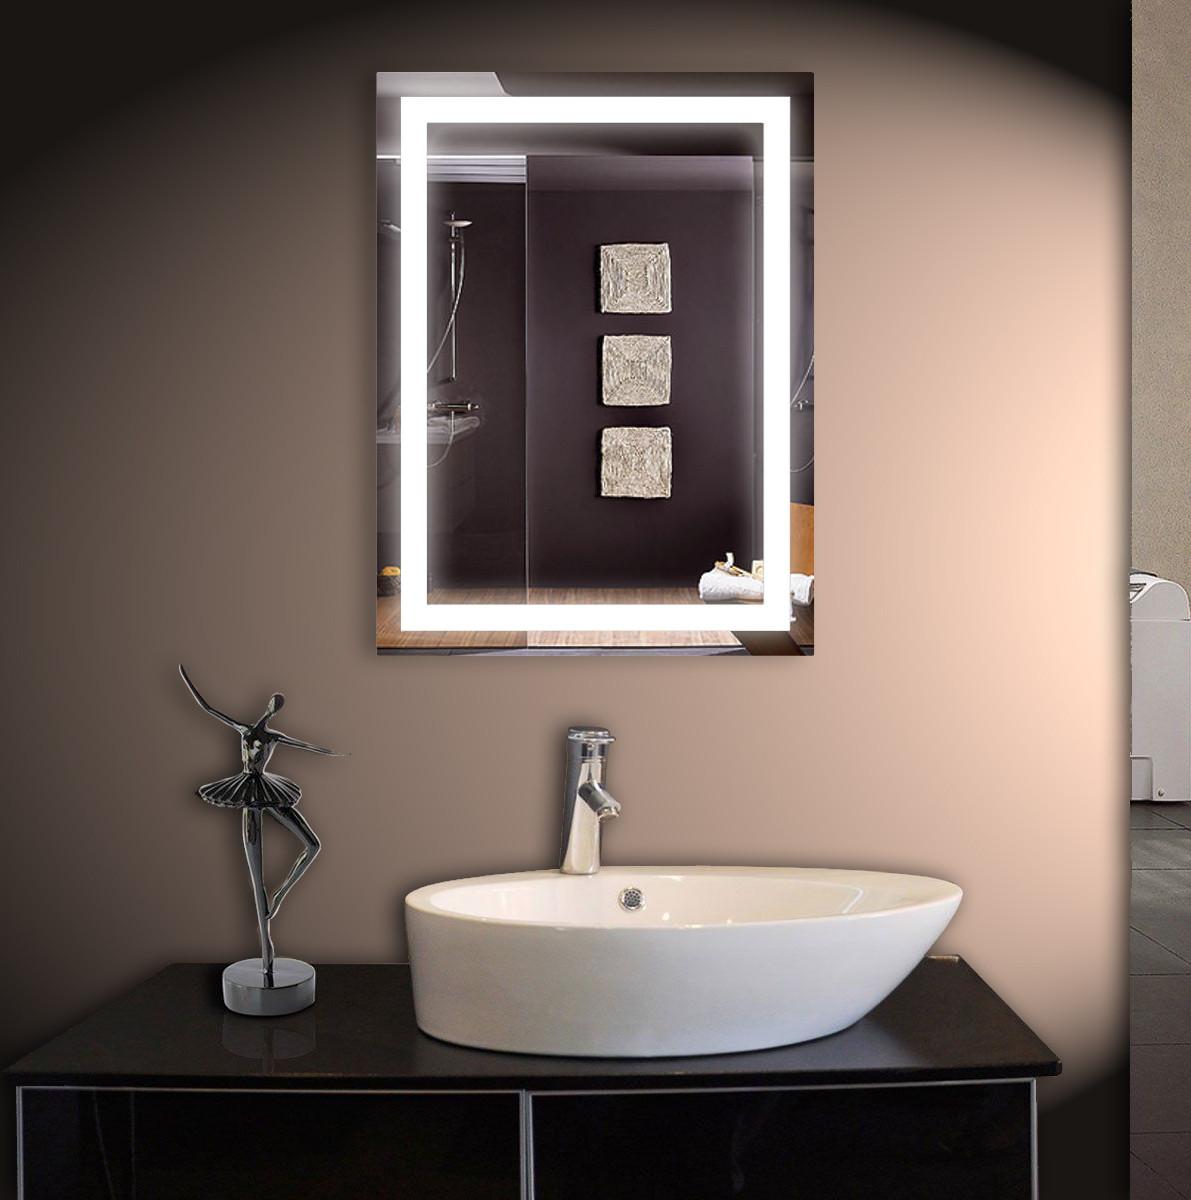 Зеркало LED со светодиодной подсветкой ver-301 500х800 мм